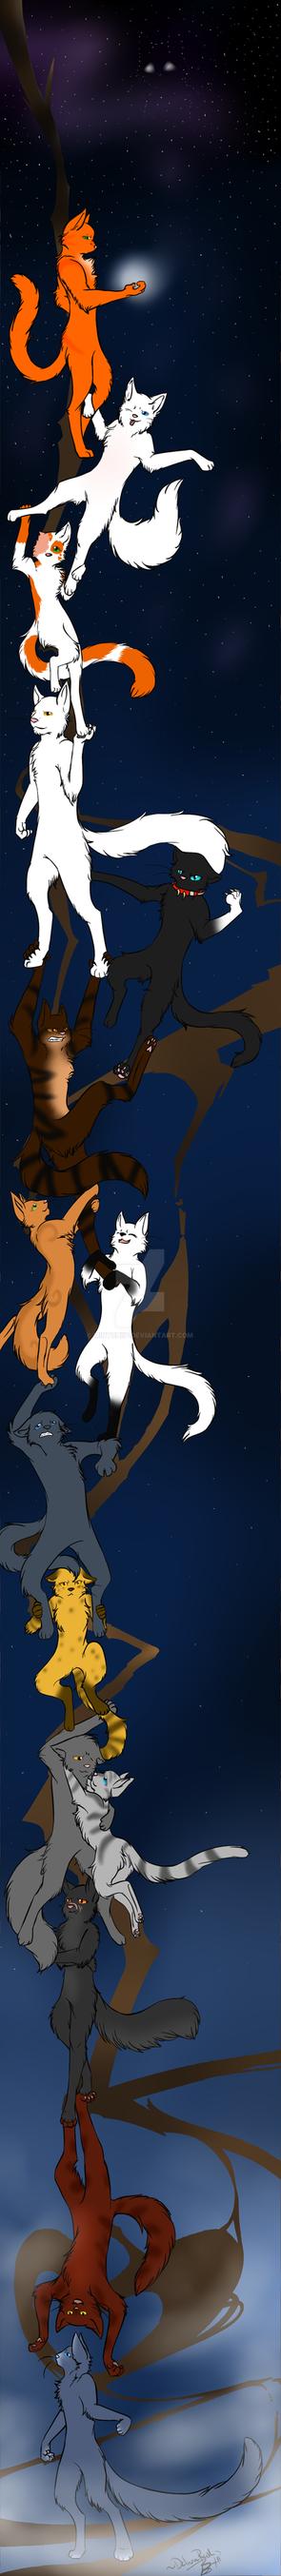 Durarara - Warrior Cats by LindsayPrower